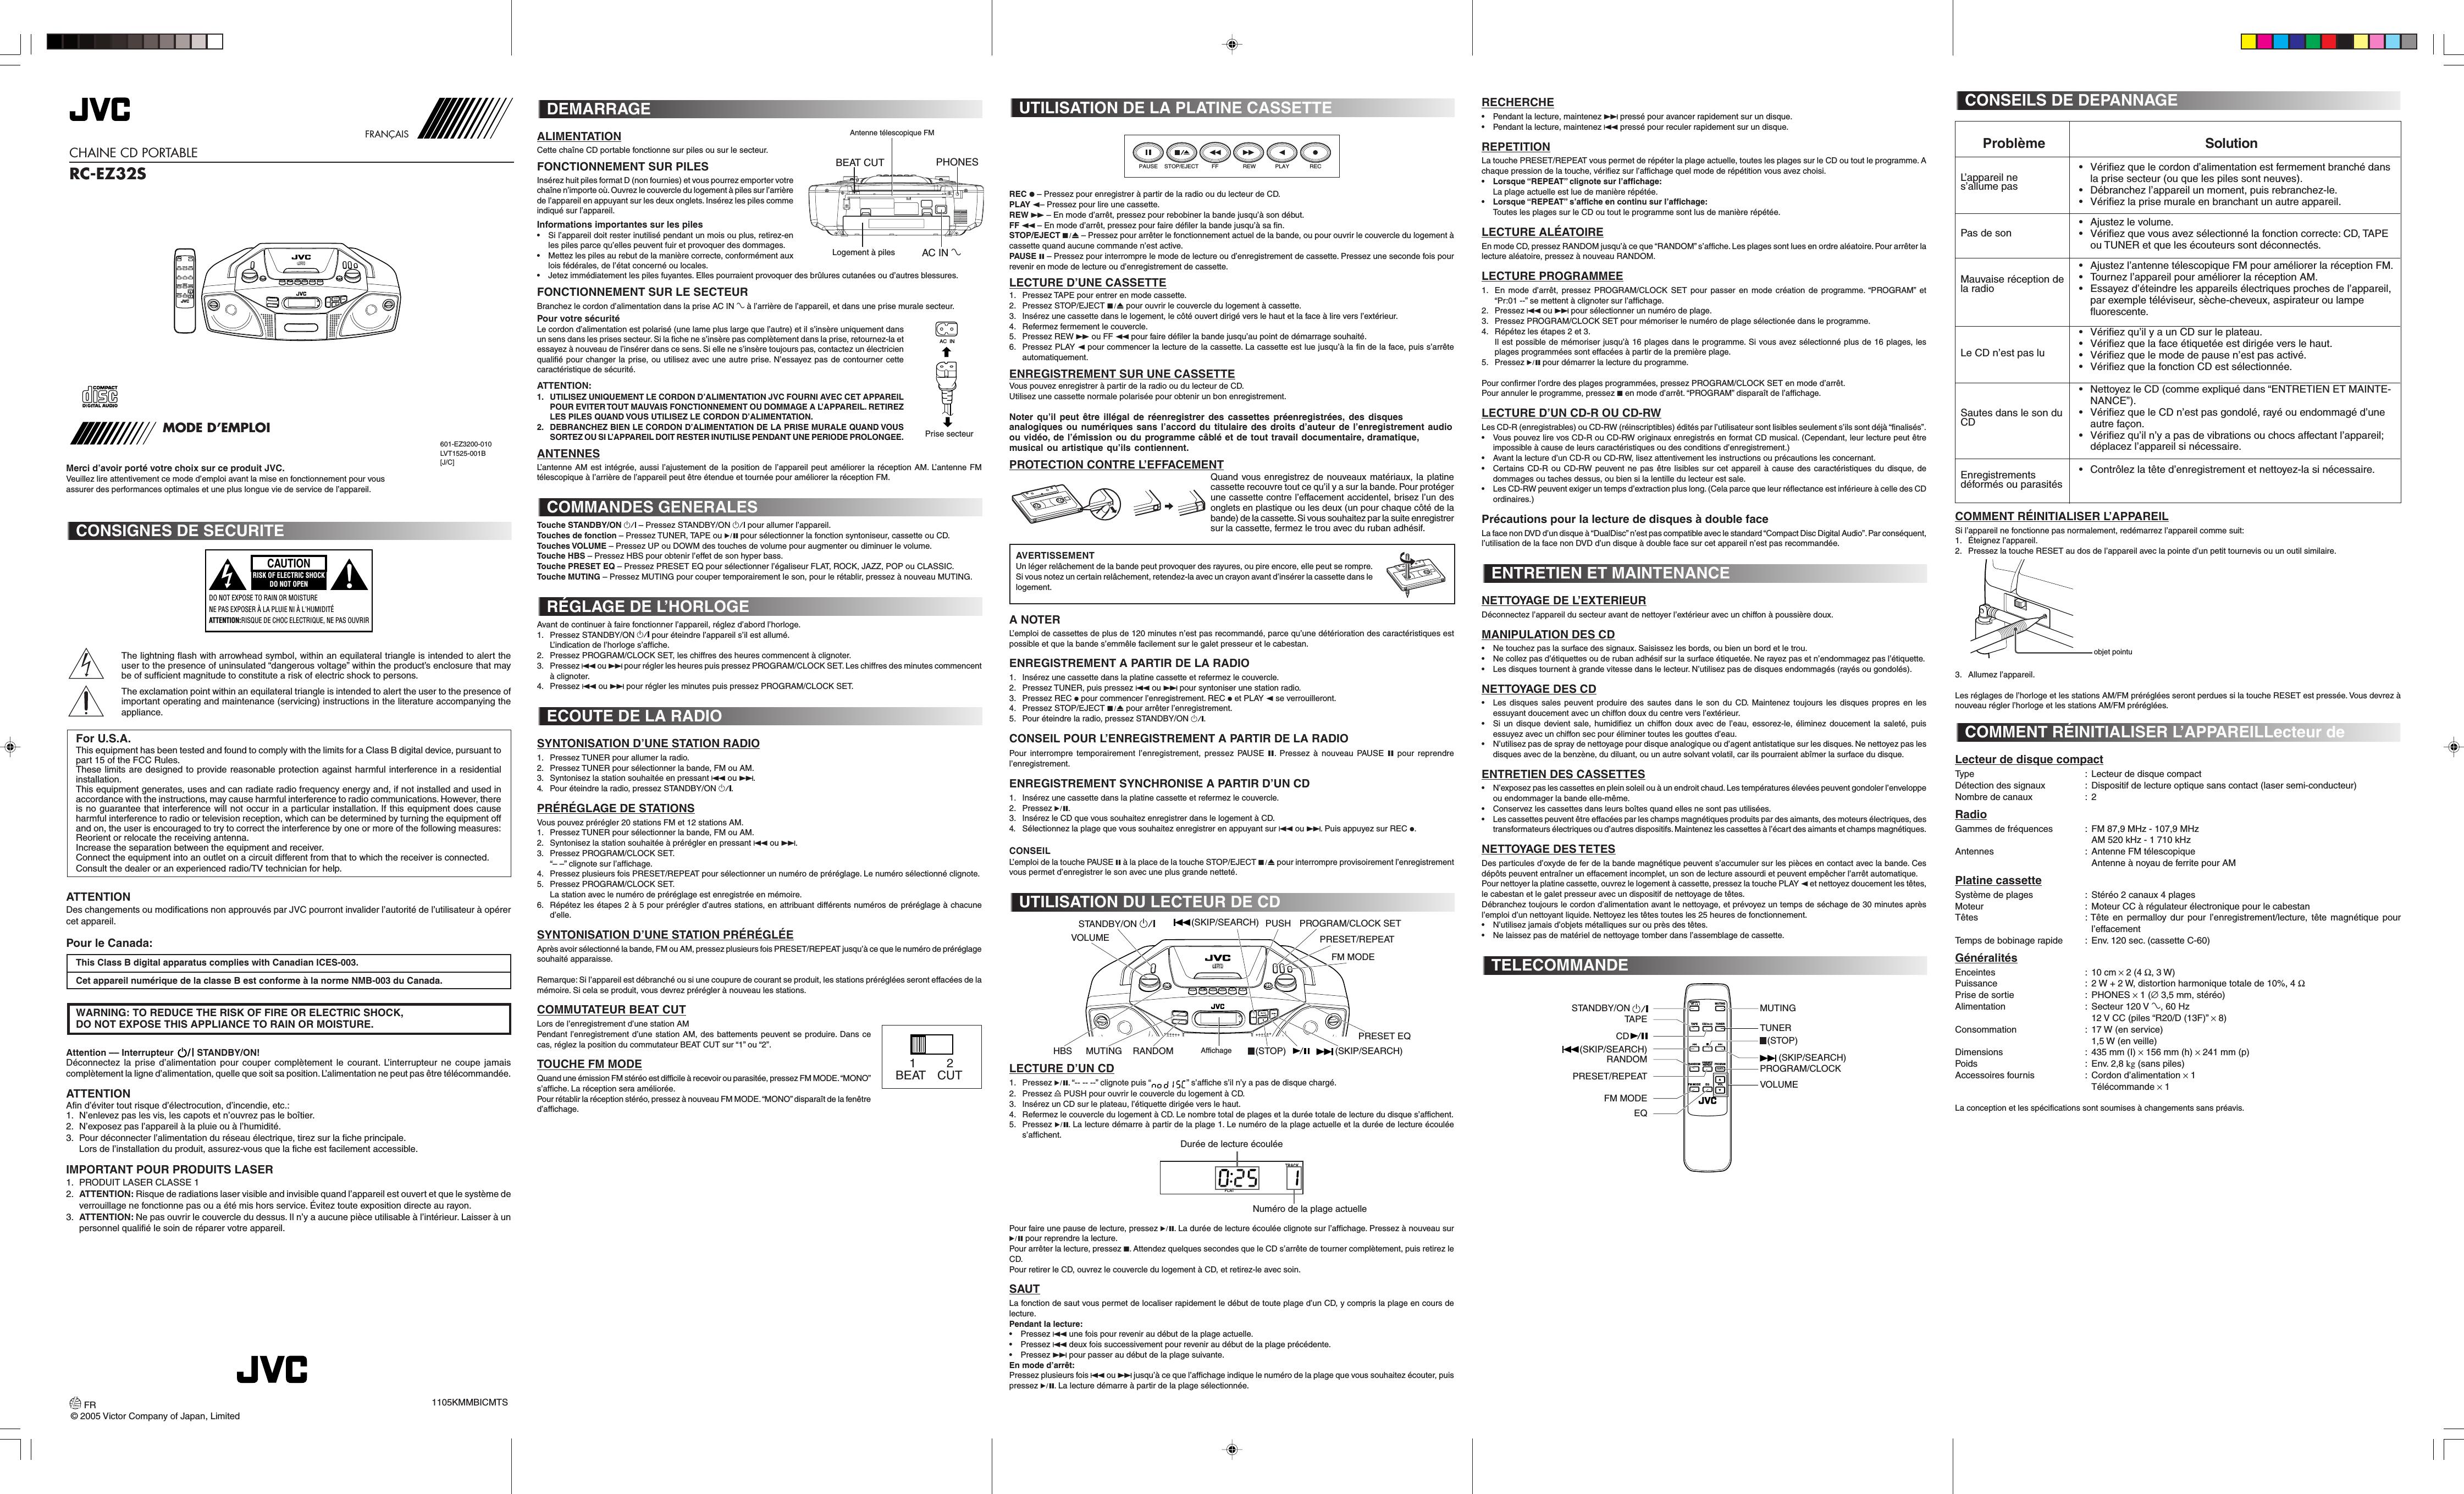 Jvc rc ez32sc ez32s user manual instructions lvt1525 001b.